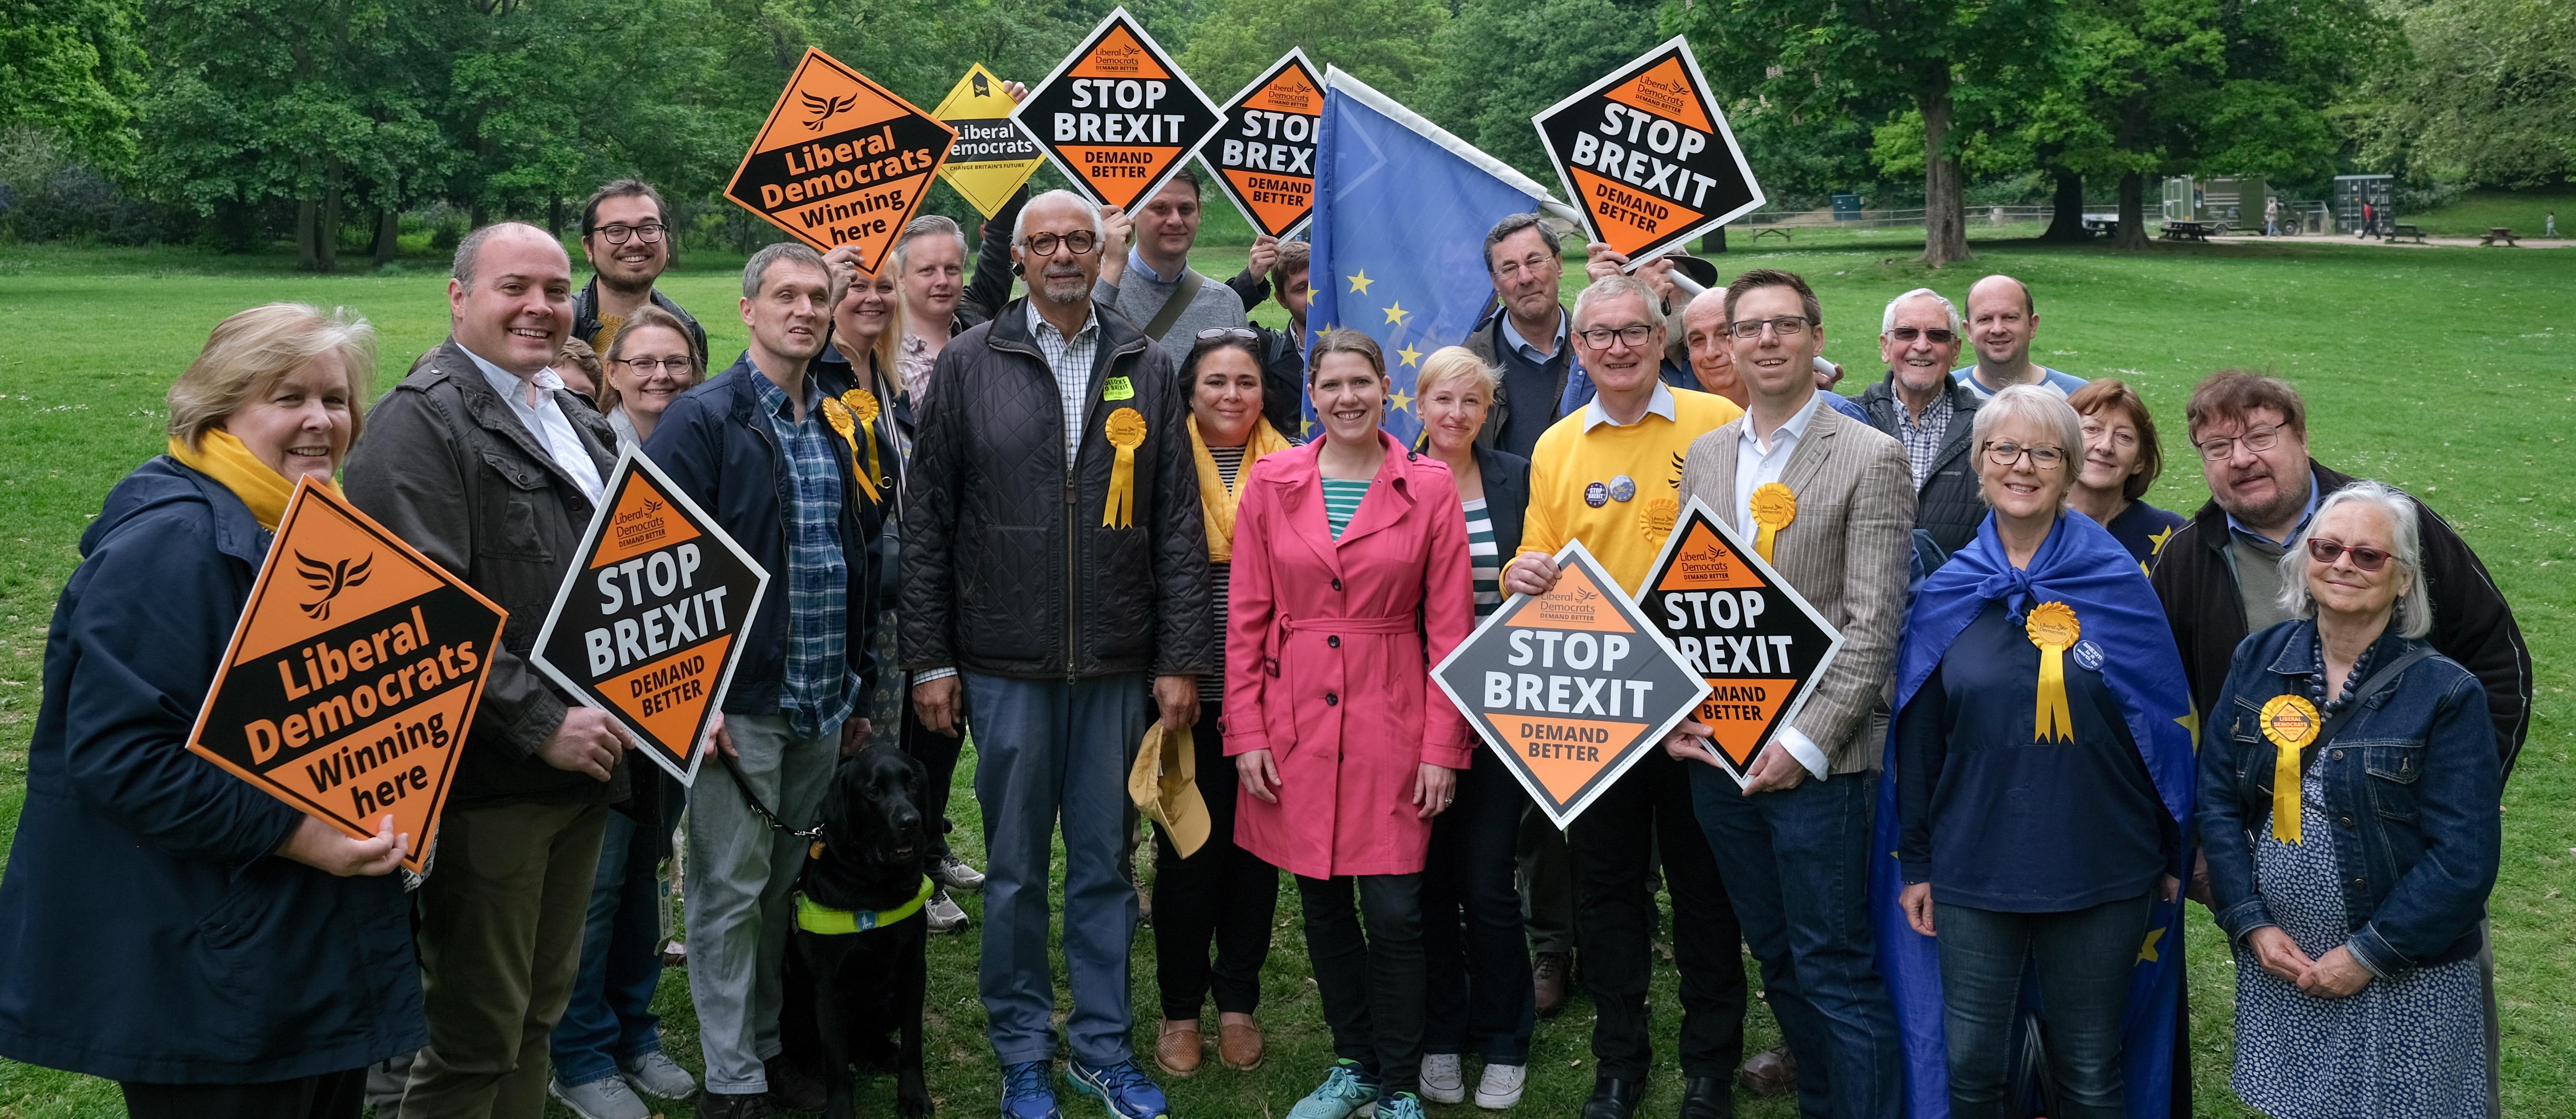 Bromley Lib Dem Membership Soars by 40%